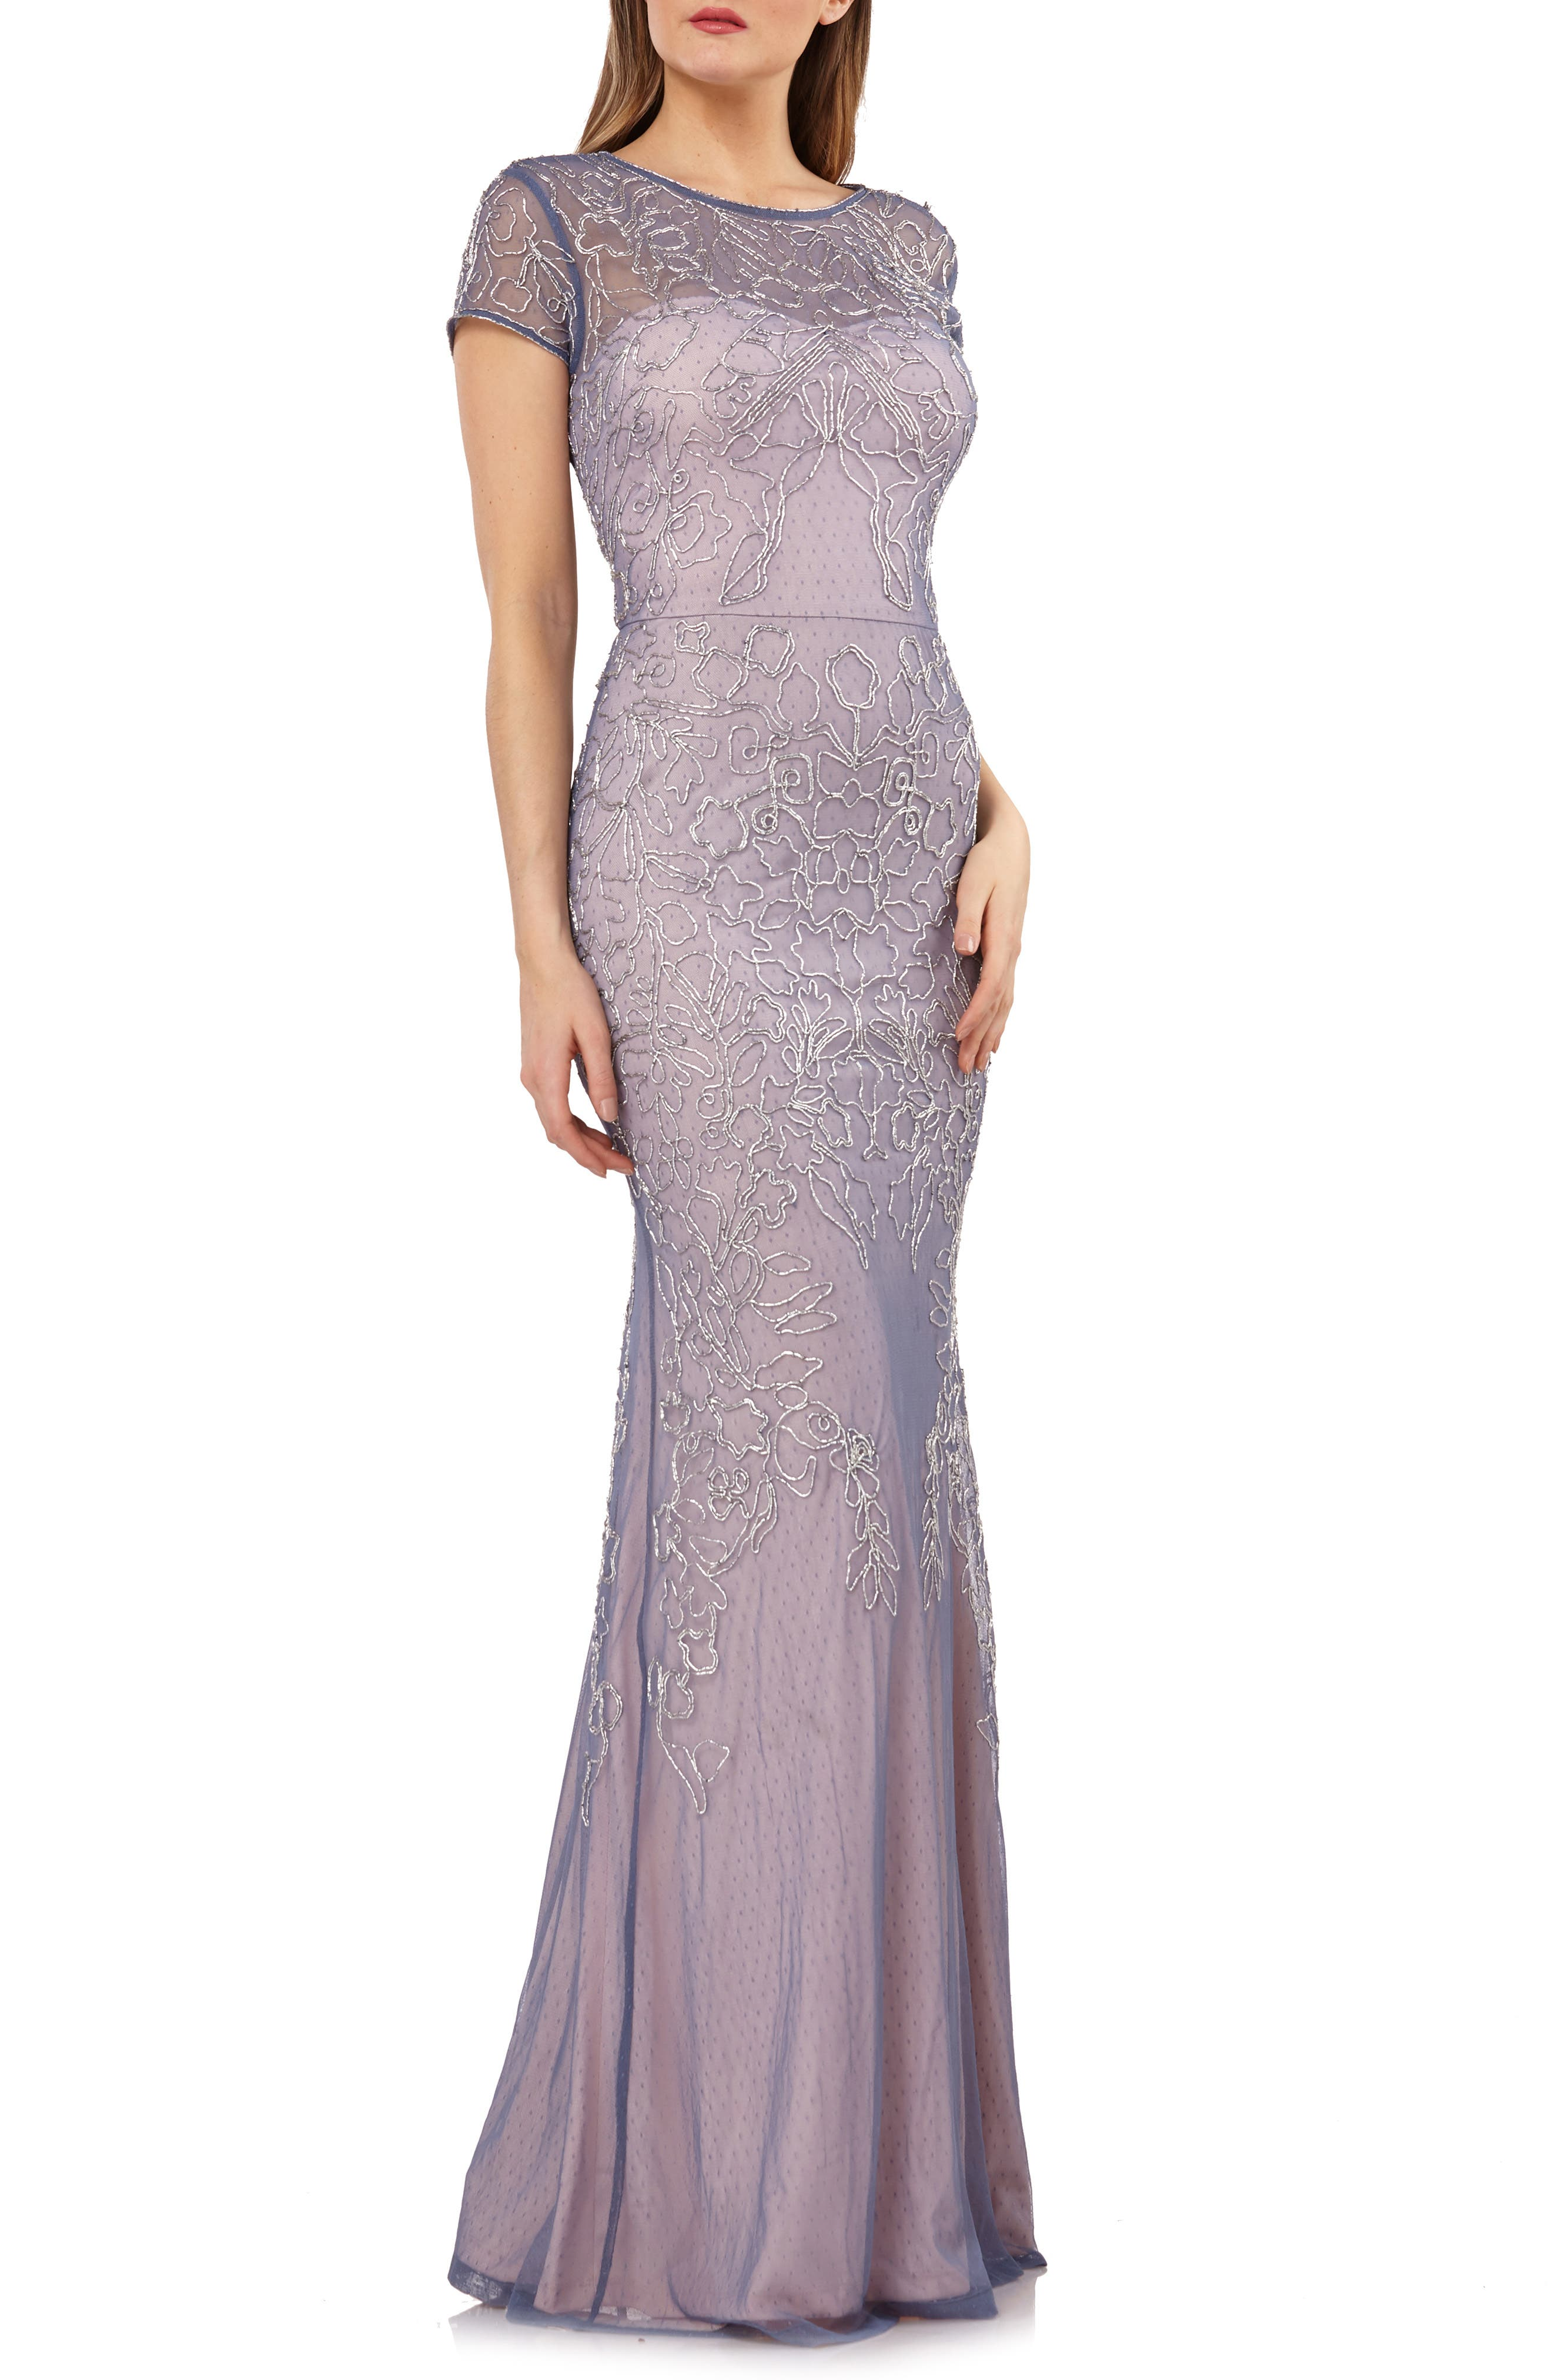 1930s Evening Dresses | Old Hollywood Dress Womens Js Collections Soutache Mesh Evening Dress $358.00 AT vintagedancer.com